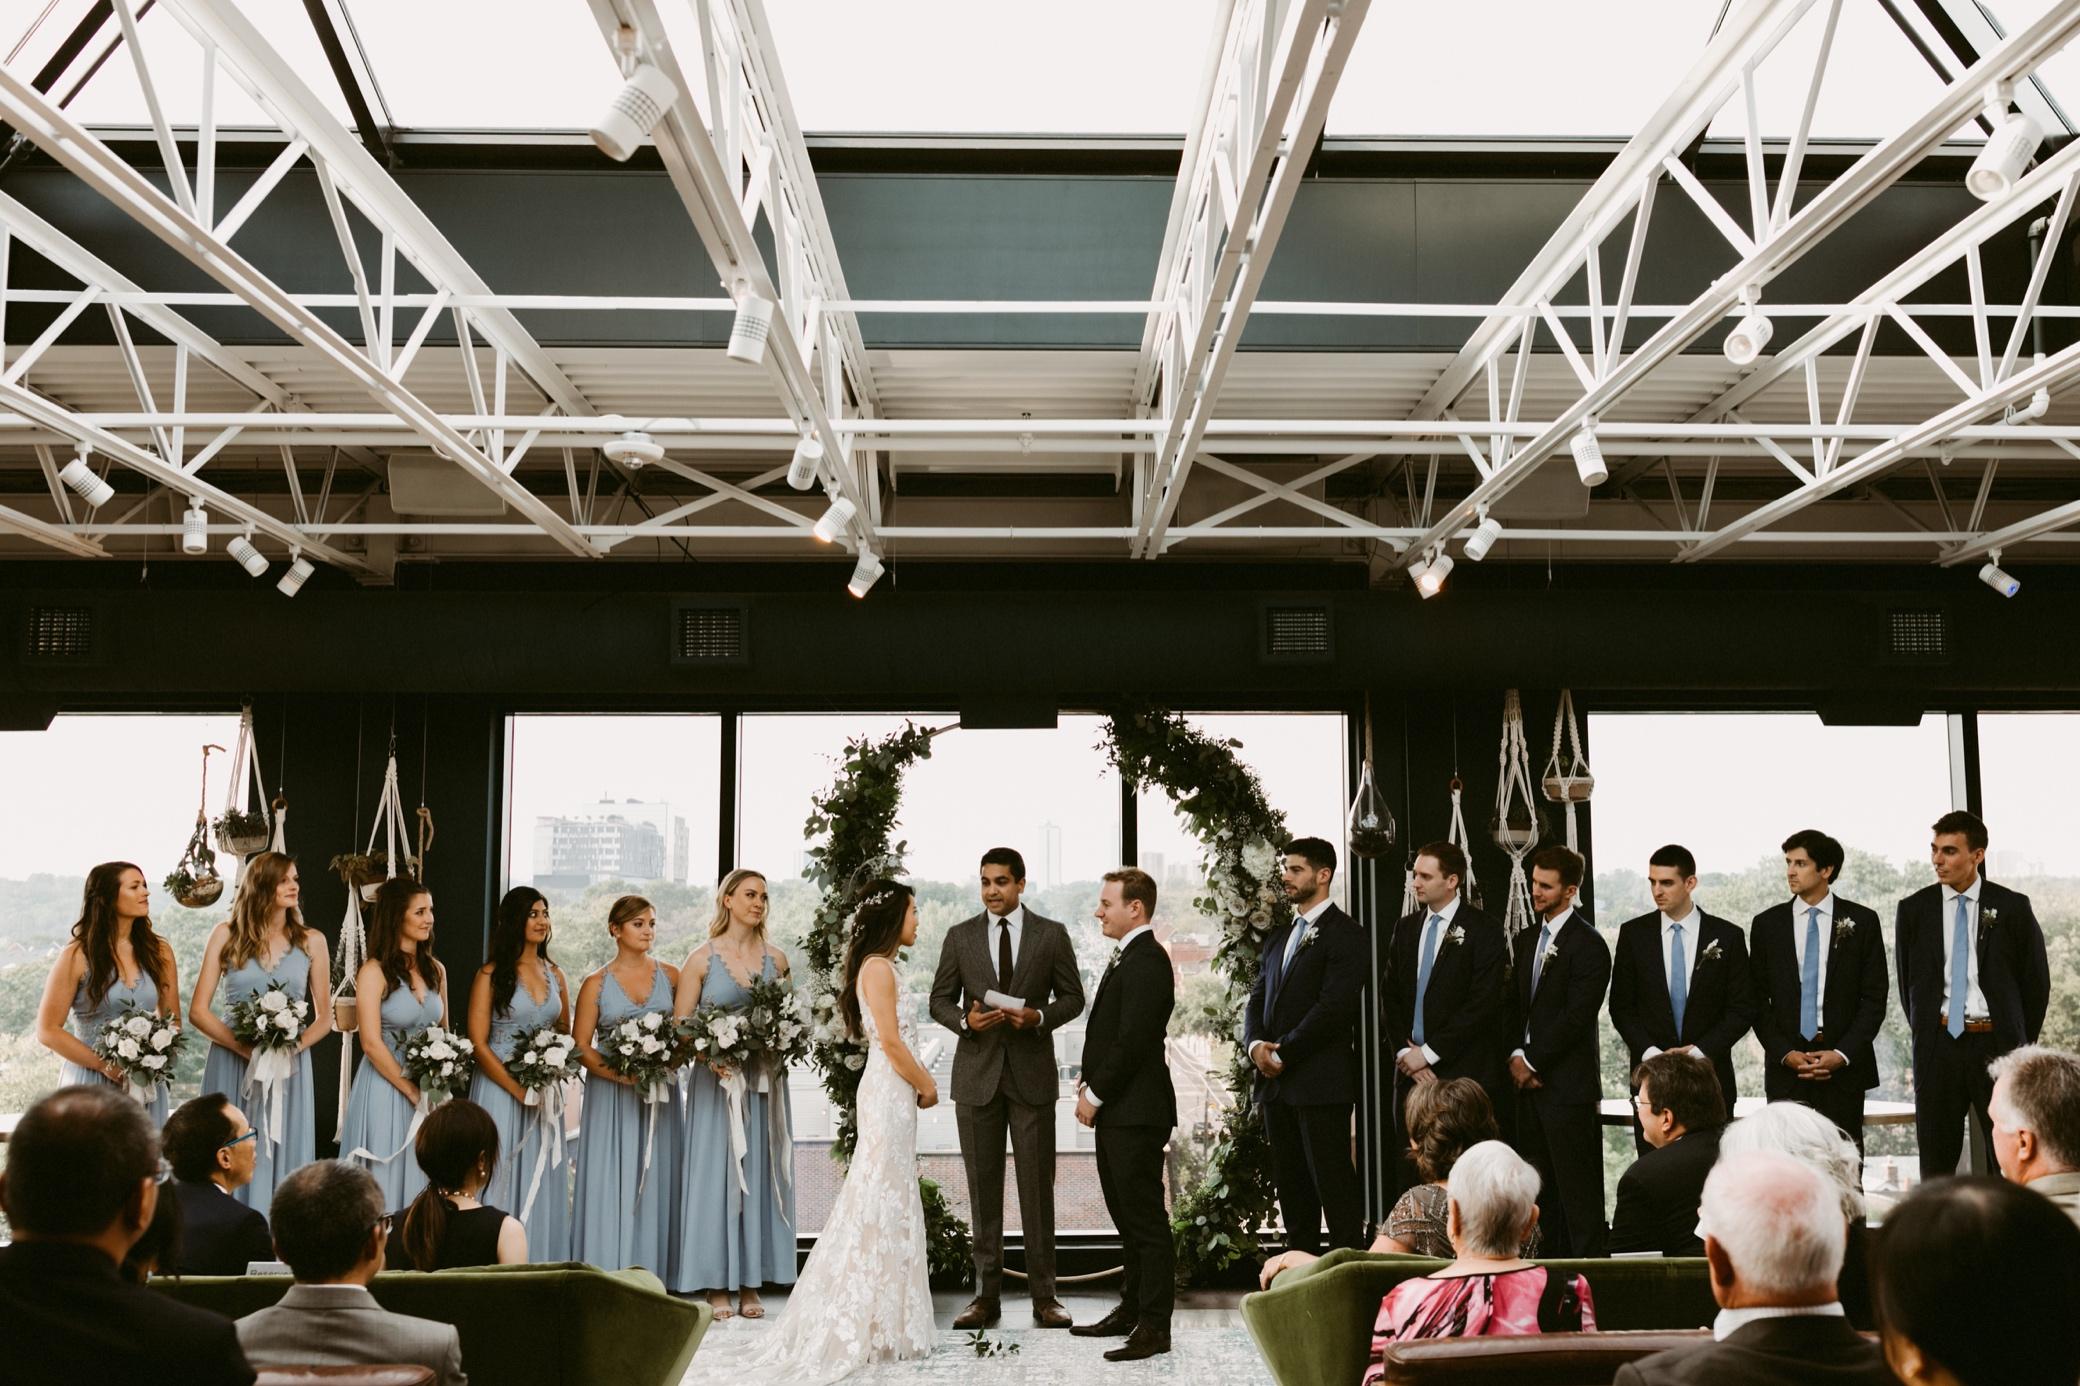 061_The Broadview Hotel Wedding (415 of 913).jpg